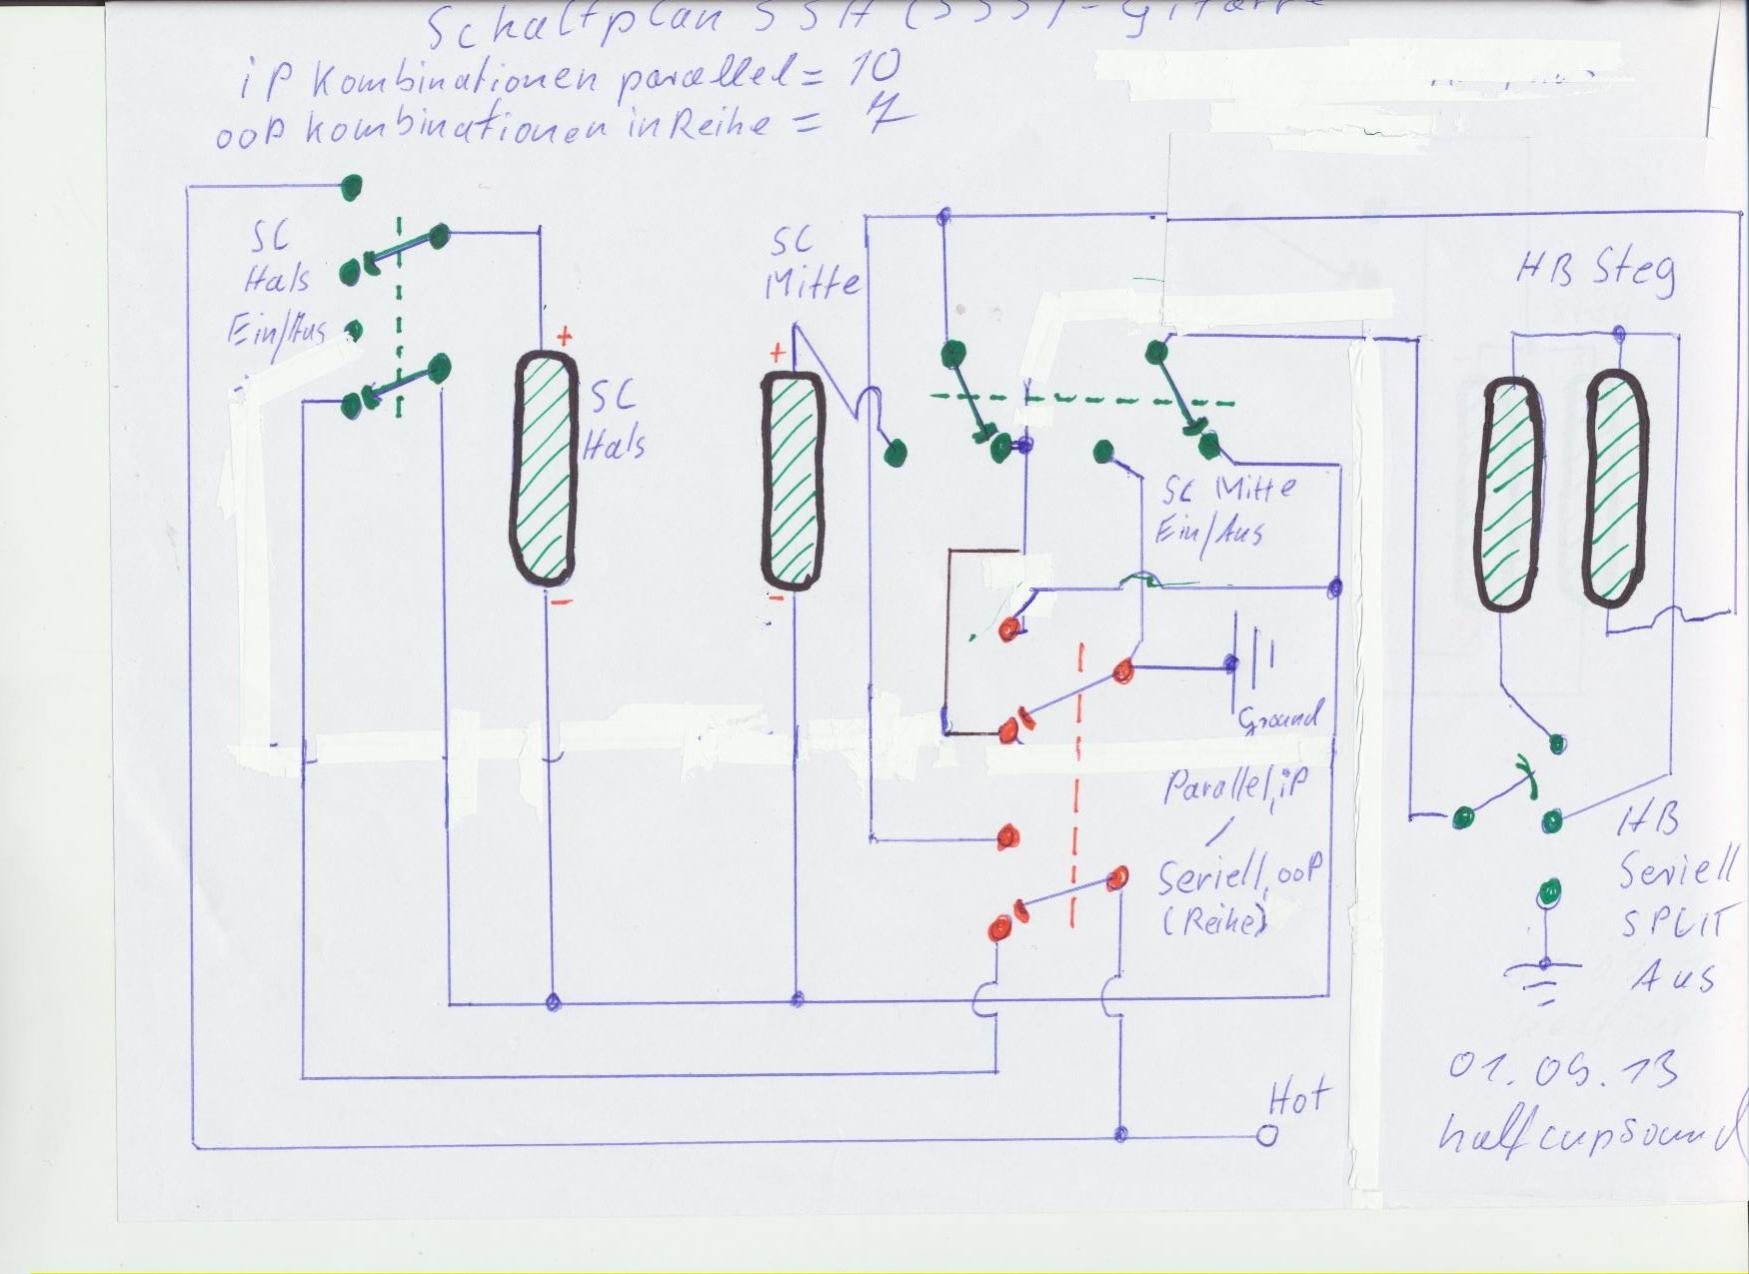 Groß Fabrik Hss Gitarre Schaltplan Bilder - Schaltplan Serie Circuit ...